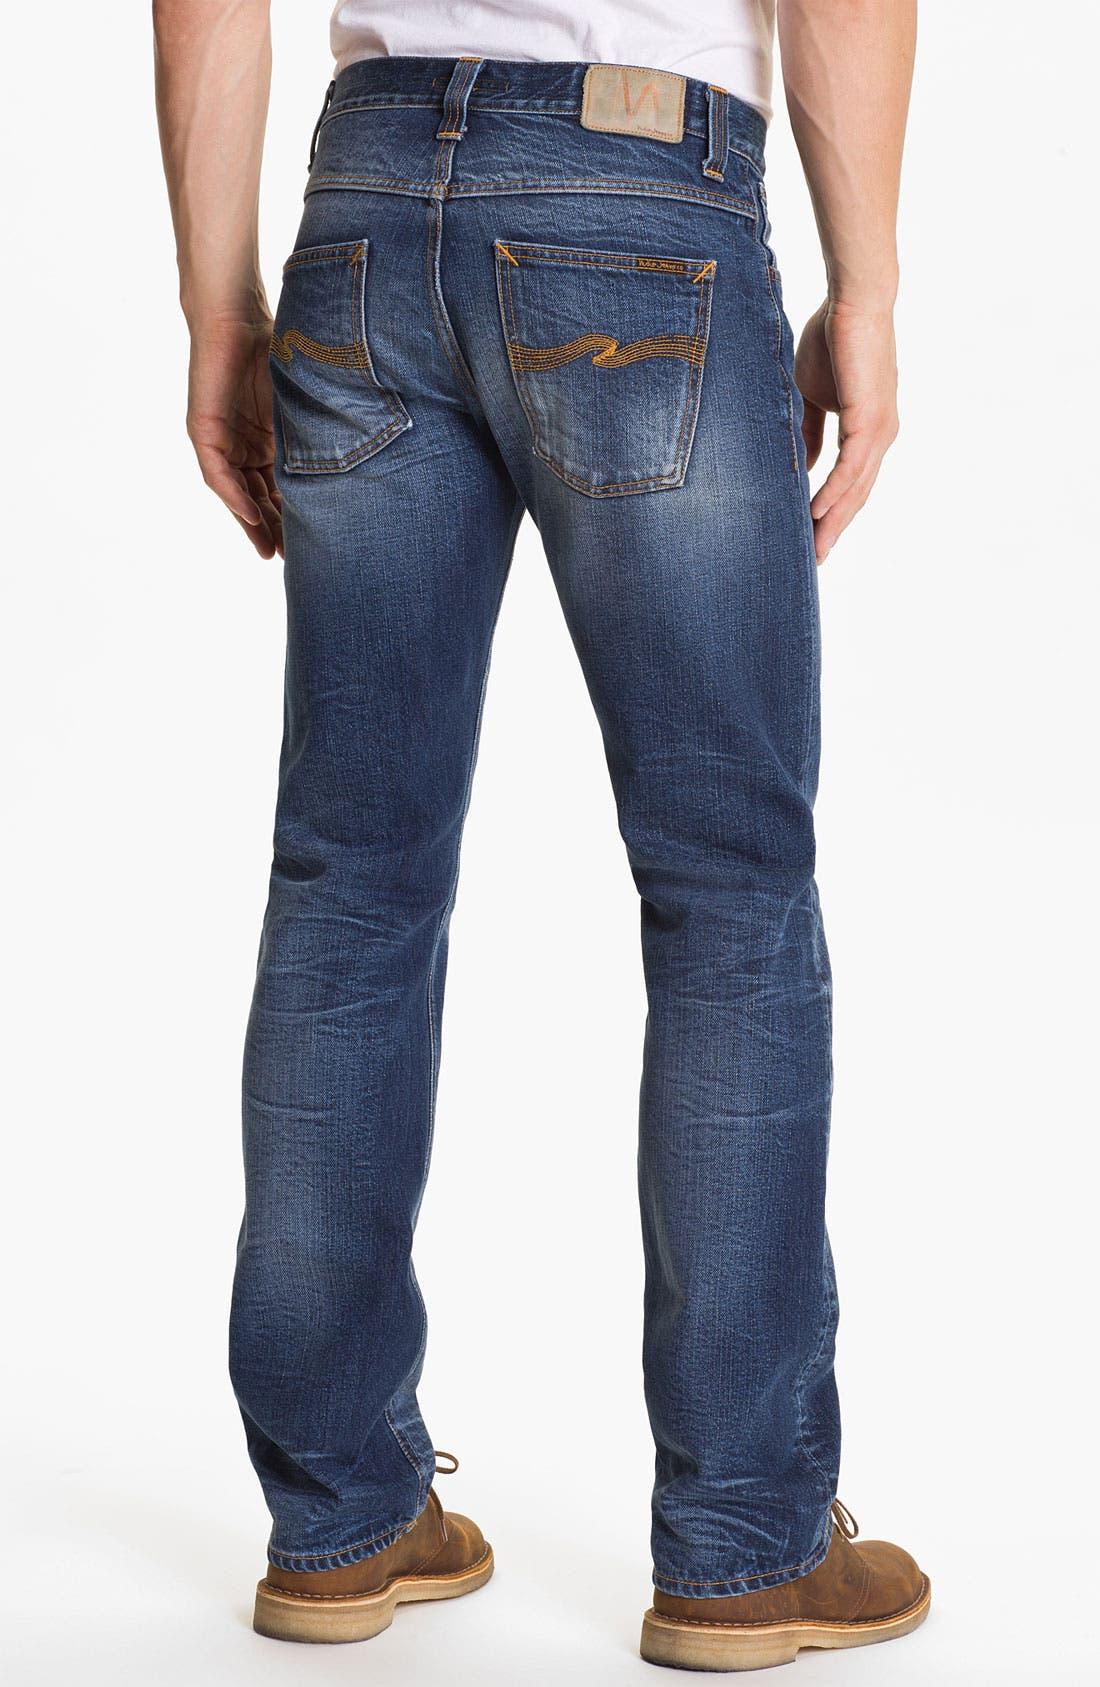 Alternate Image 1 Selected - Nudie 'Average Joe' Straight Leg Jeans (Organic Fine Contrast)